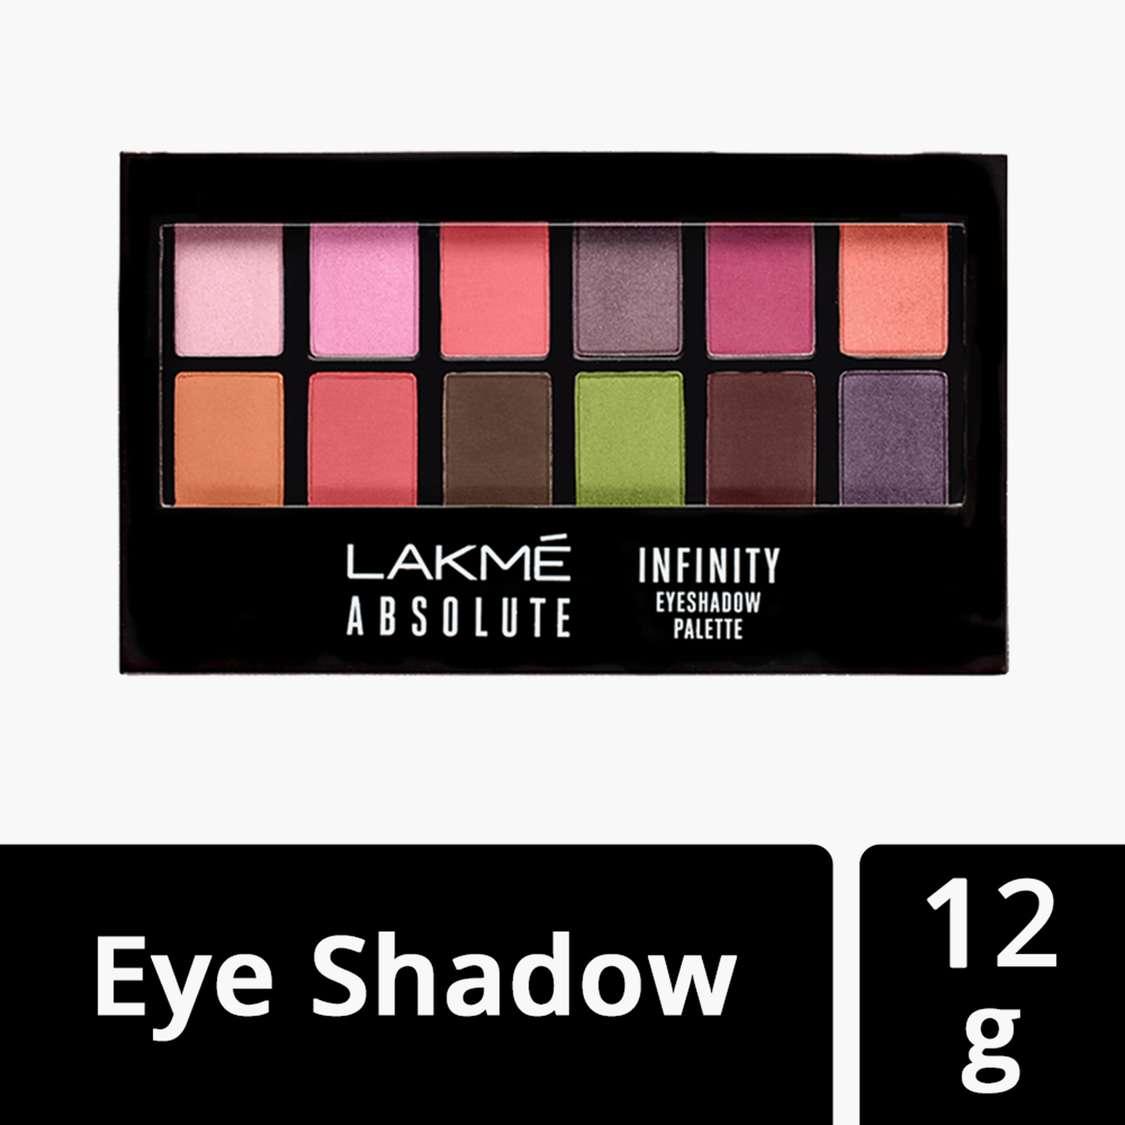 LAKME ABSOLUTE Infinity Eye Shadow Palette jpg